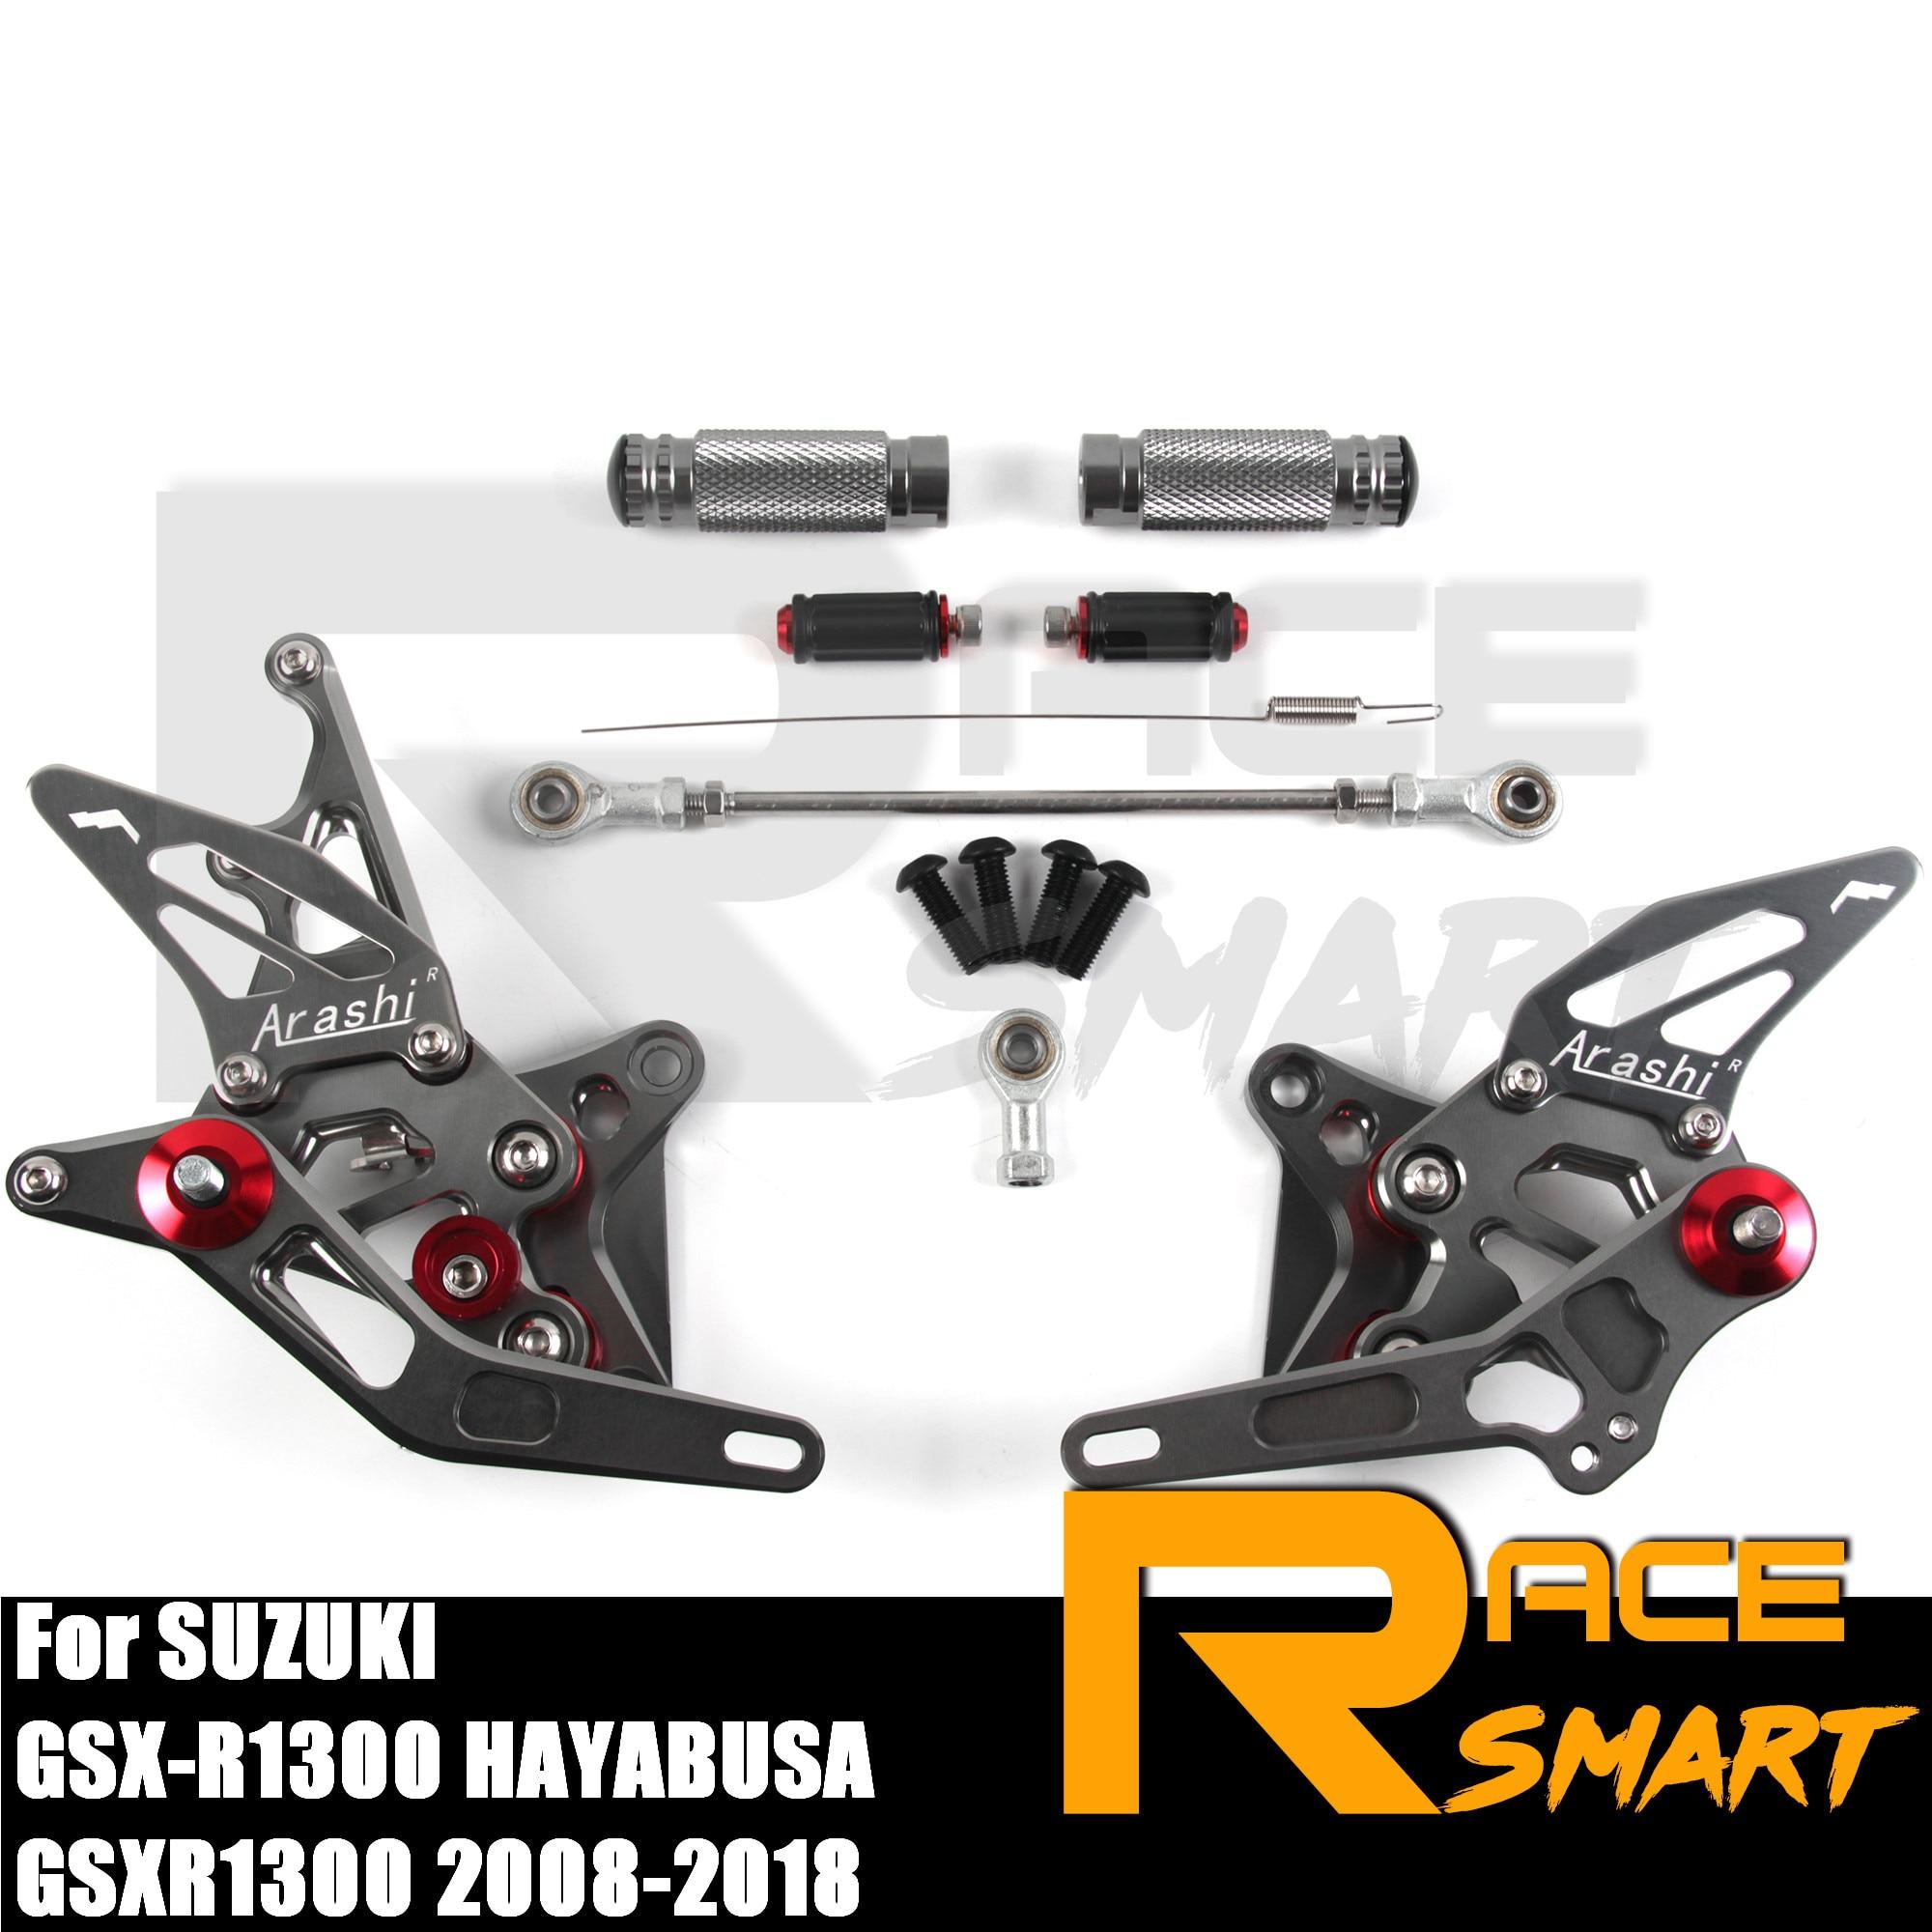 For SUZUKI GSX1300R HAYABUSA 99-12 11 10 09 08 CNC Foot pegs Rearsets Rear set